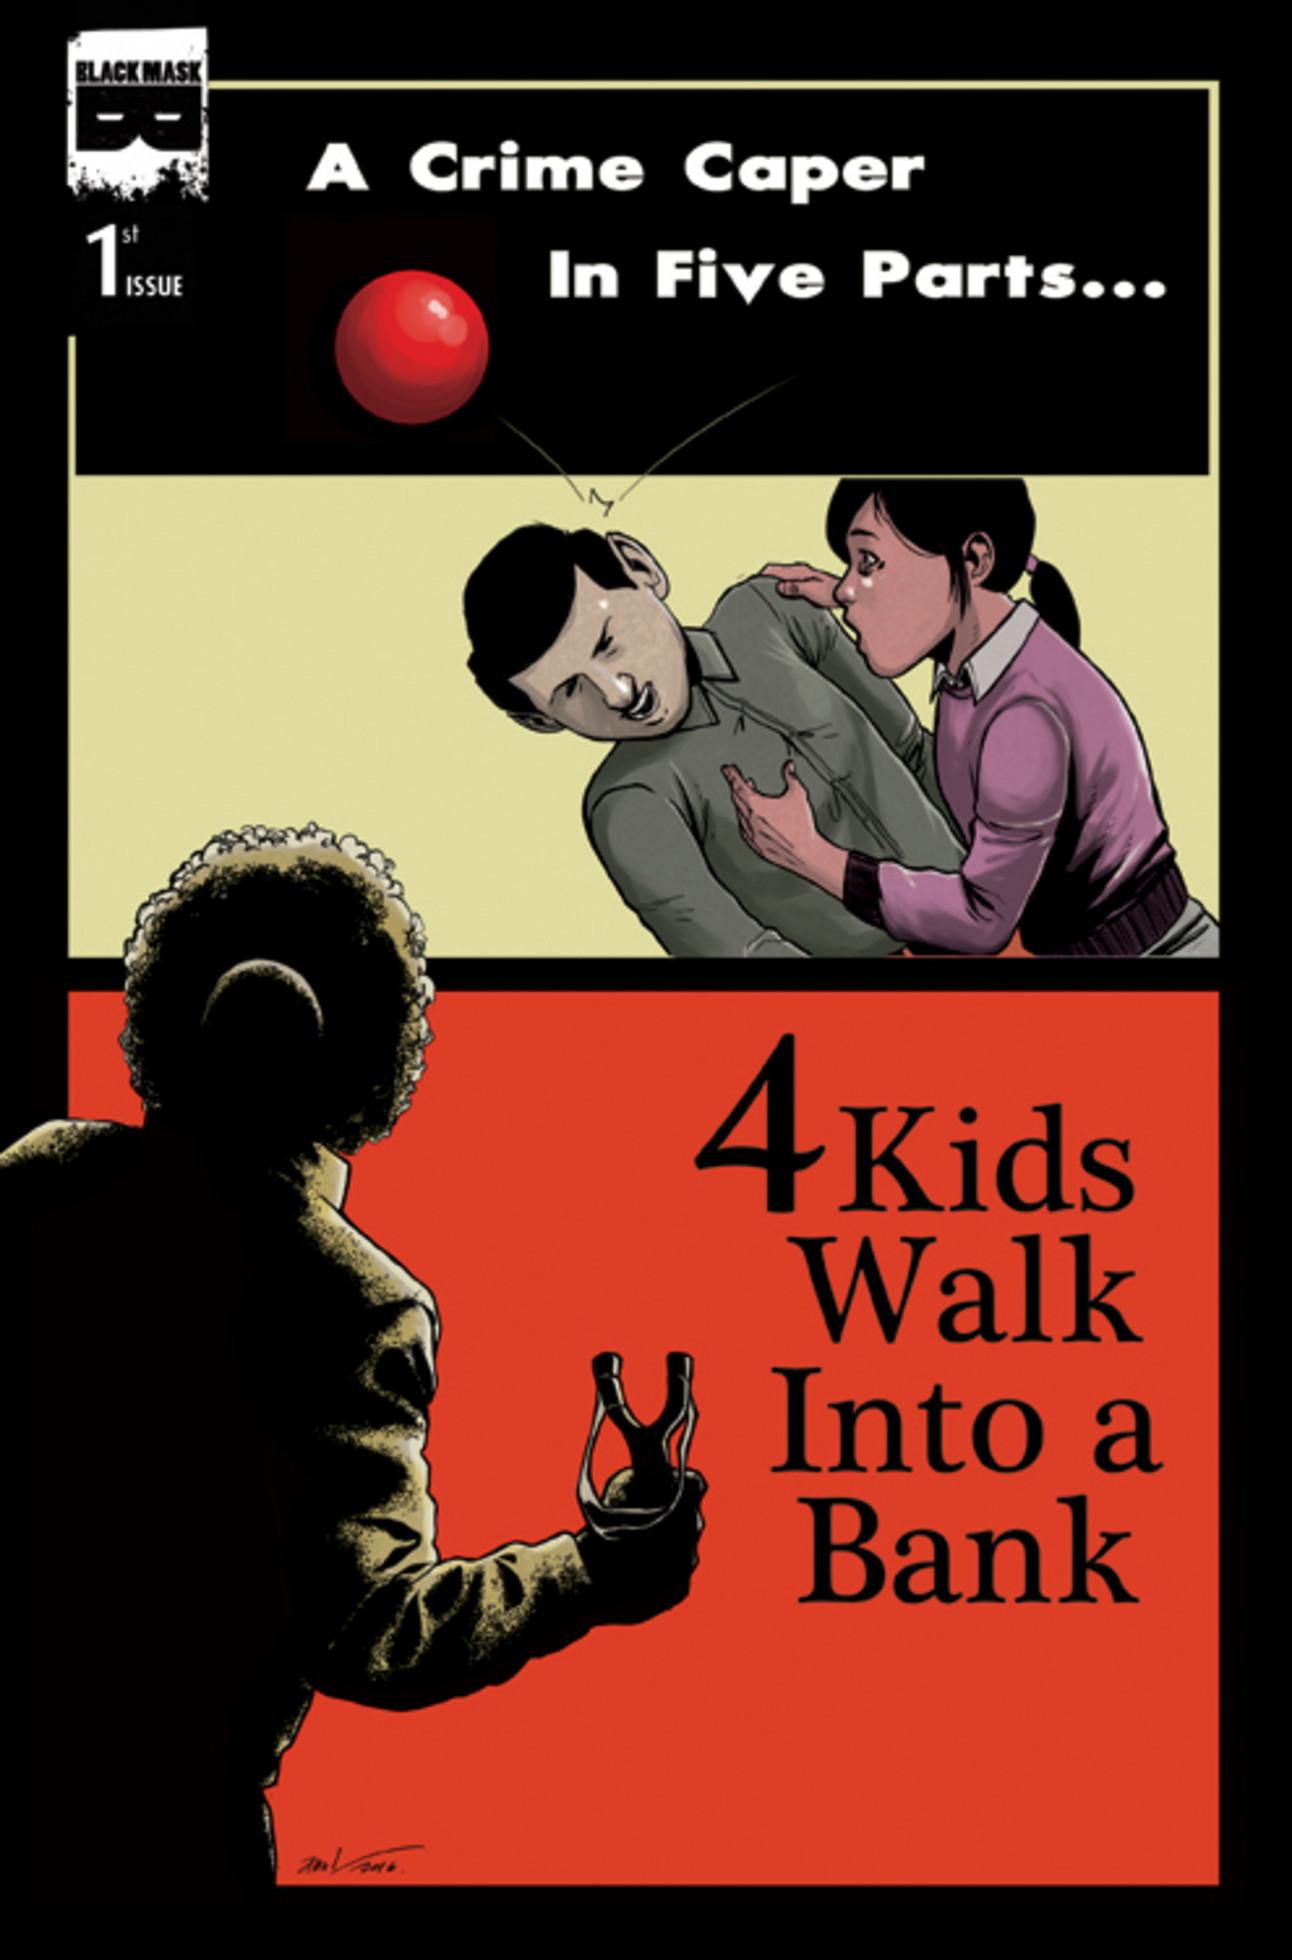 4kwiab_killers_kiss.jpg